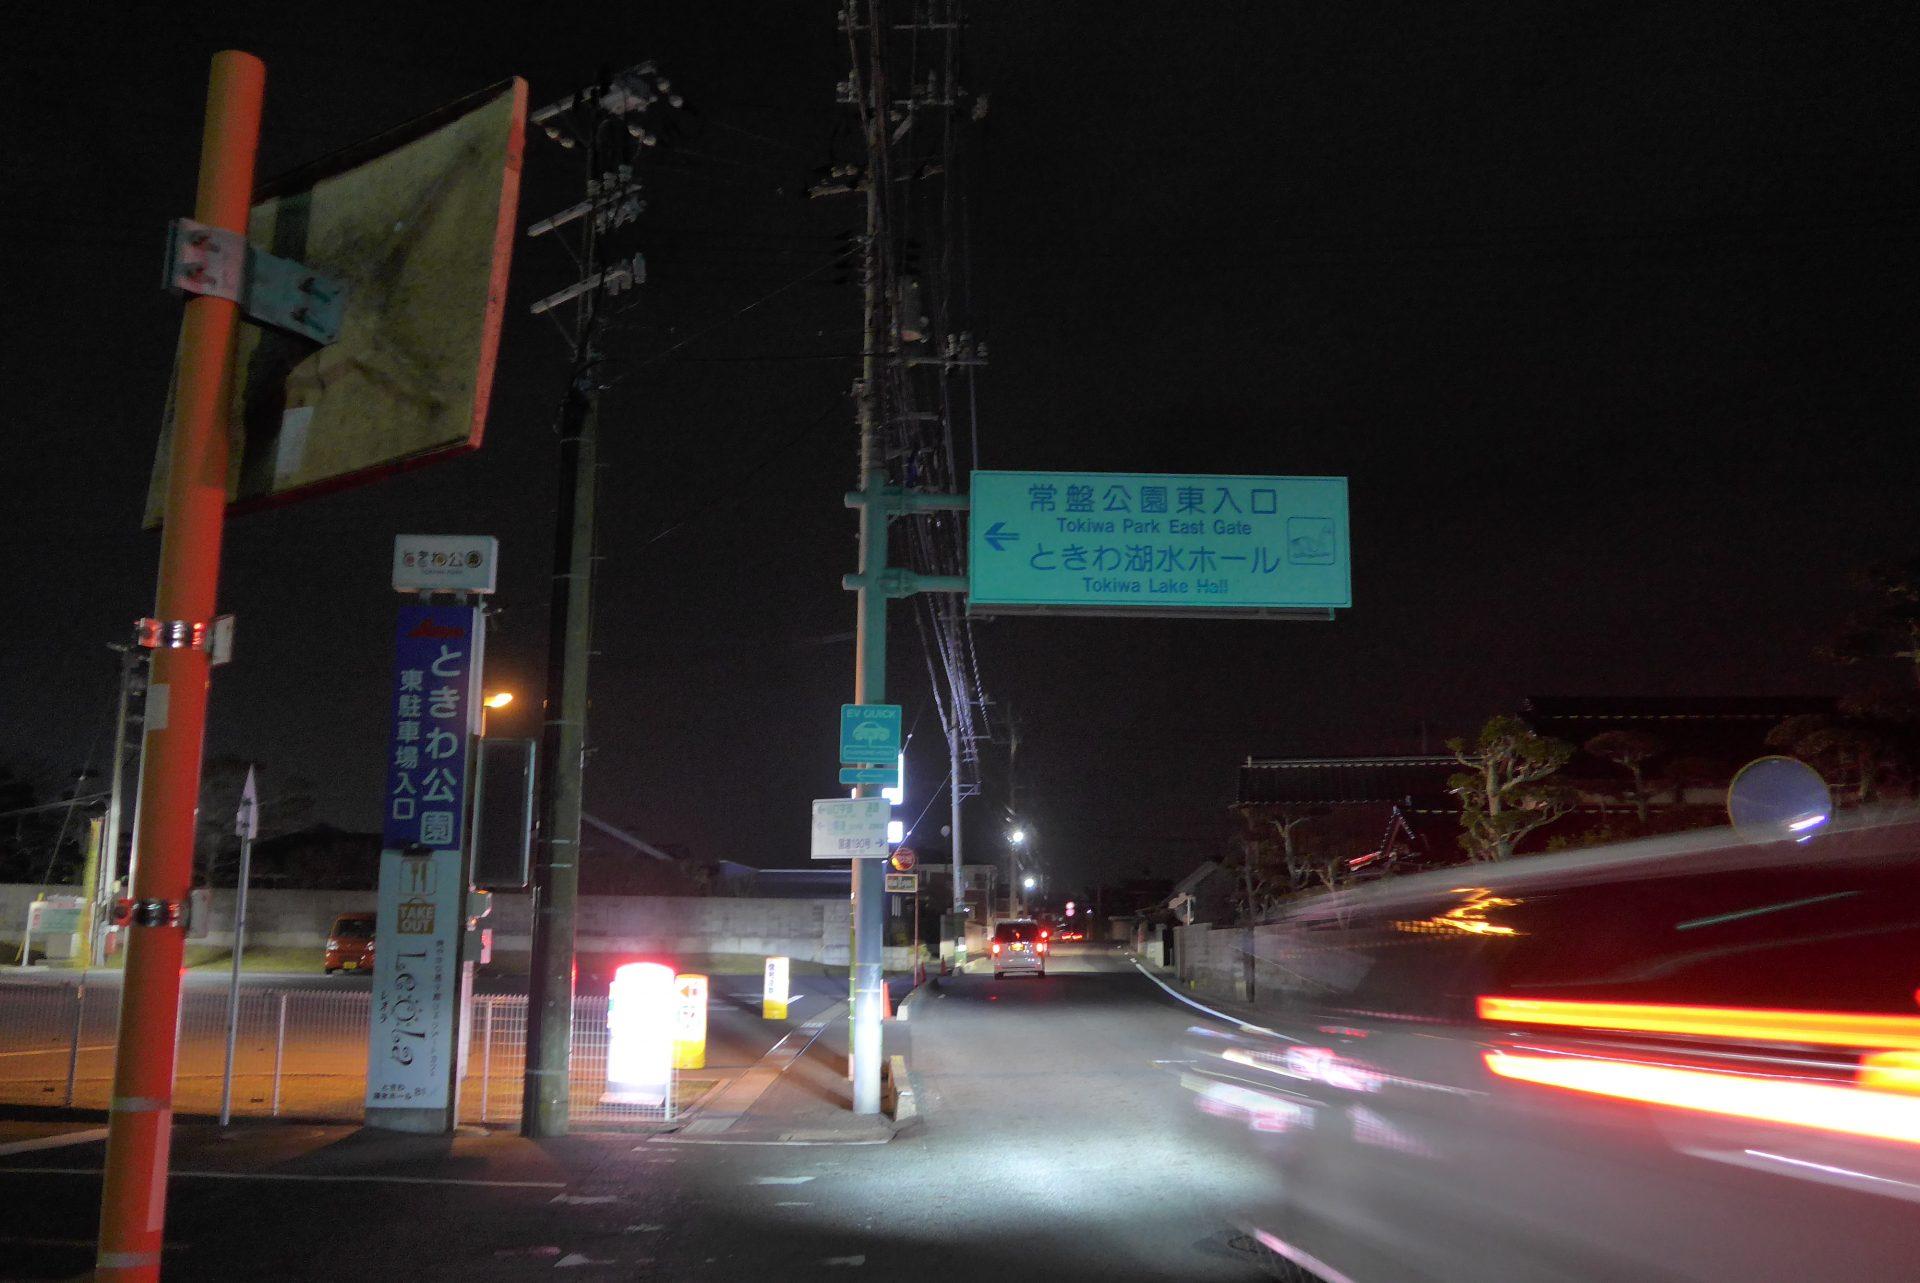 (K)常磐公園東駐車場の車中泊〜トイレ完備とコンビニ隣接の安心感